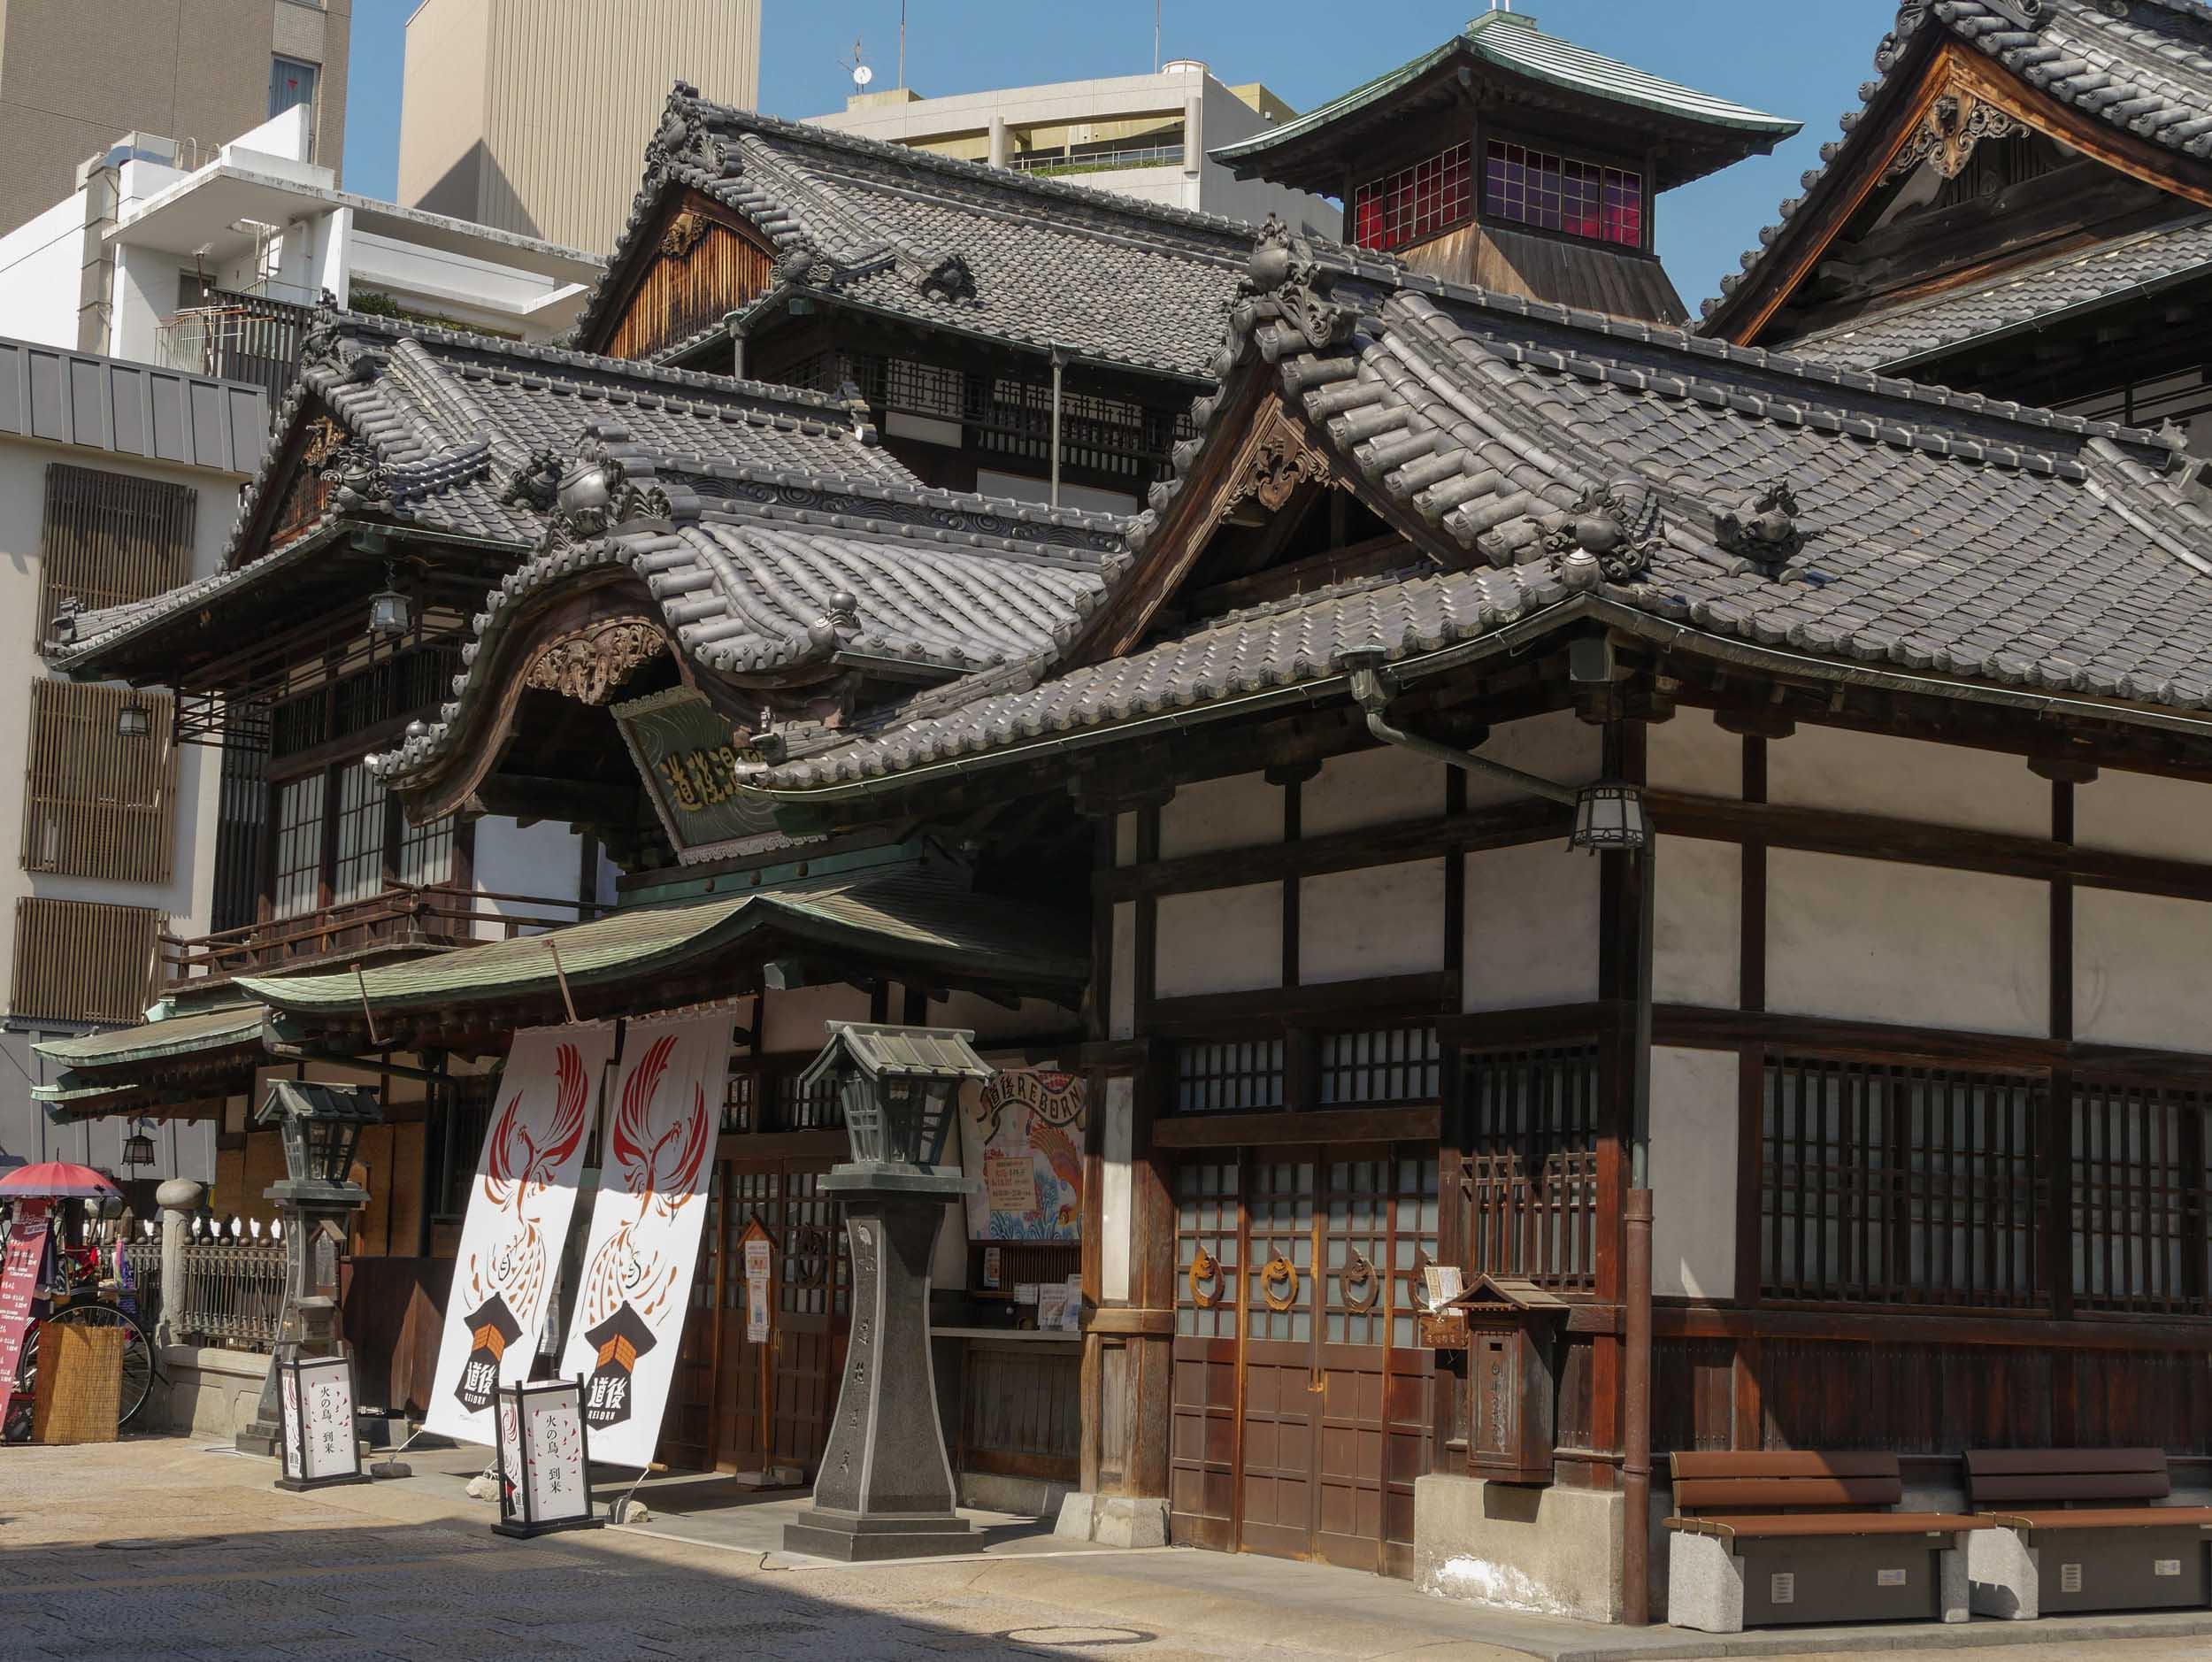 matsuyama-dougo-onsen-1.jpg